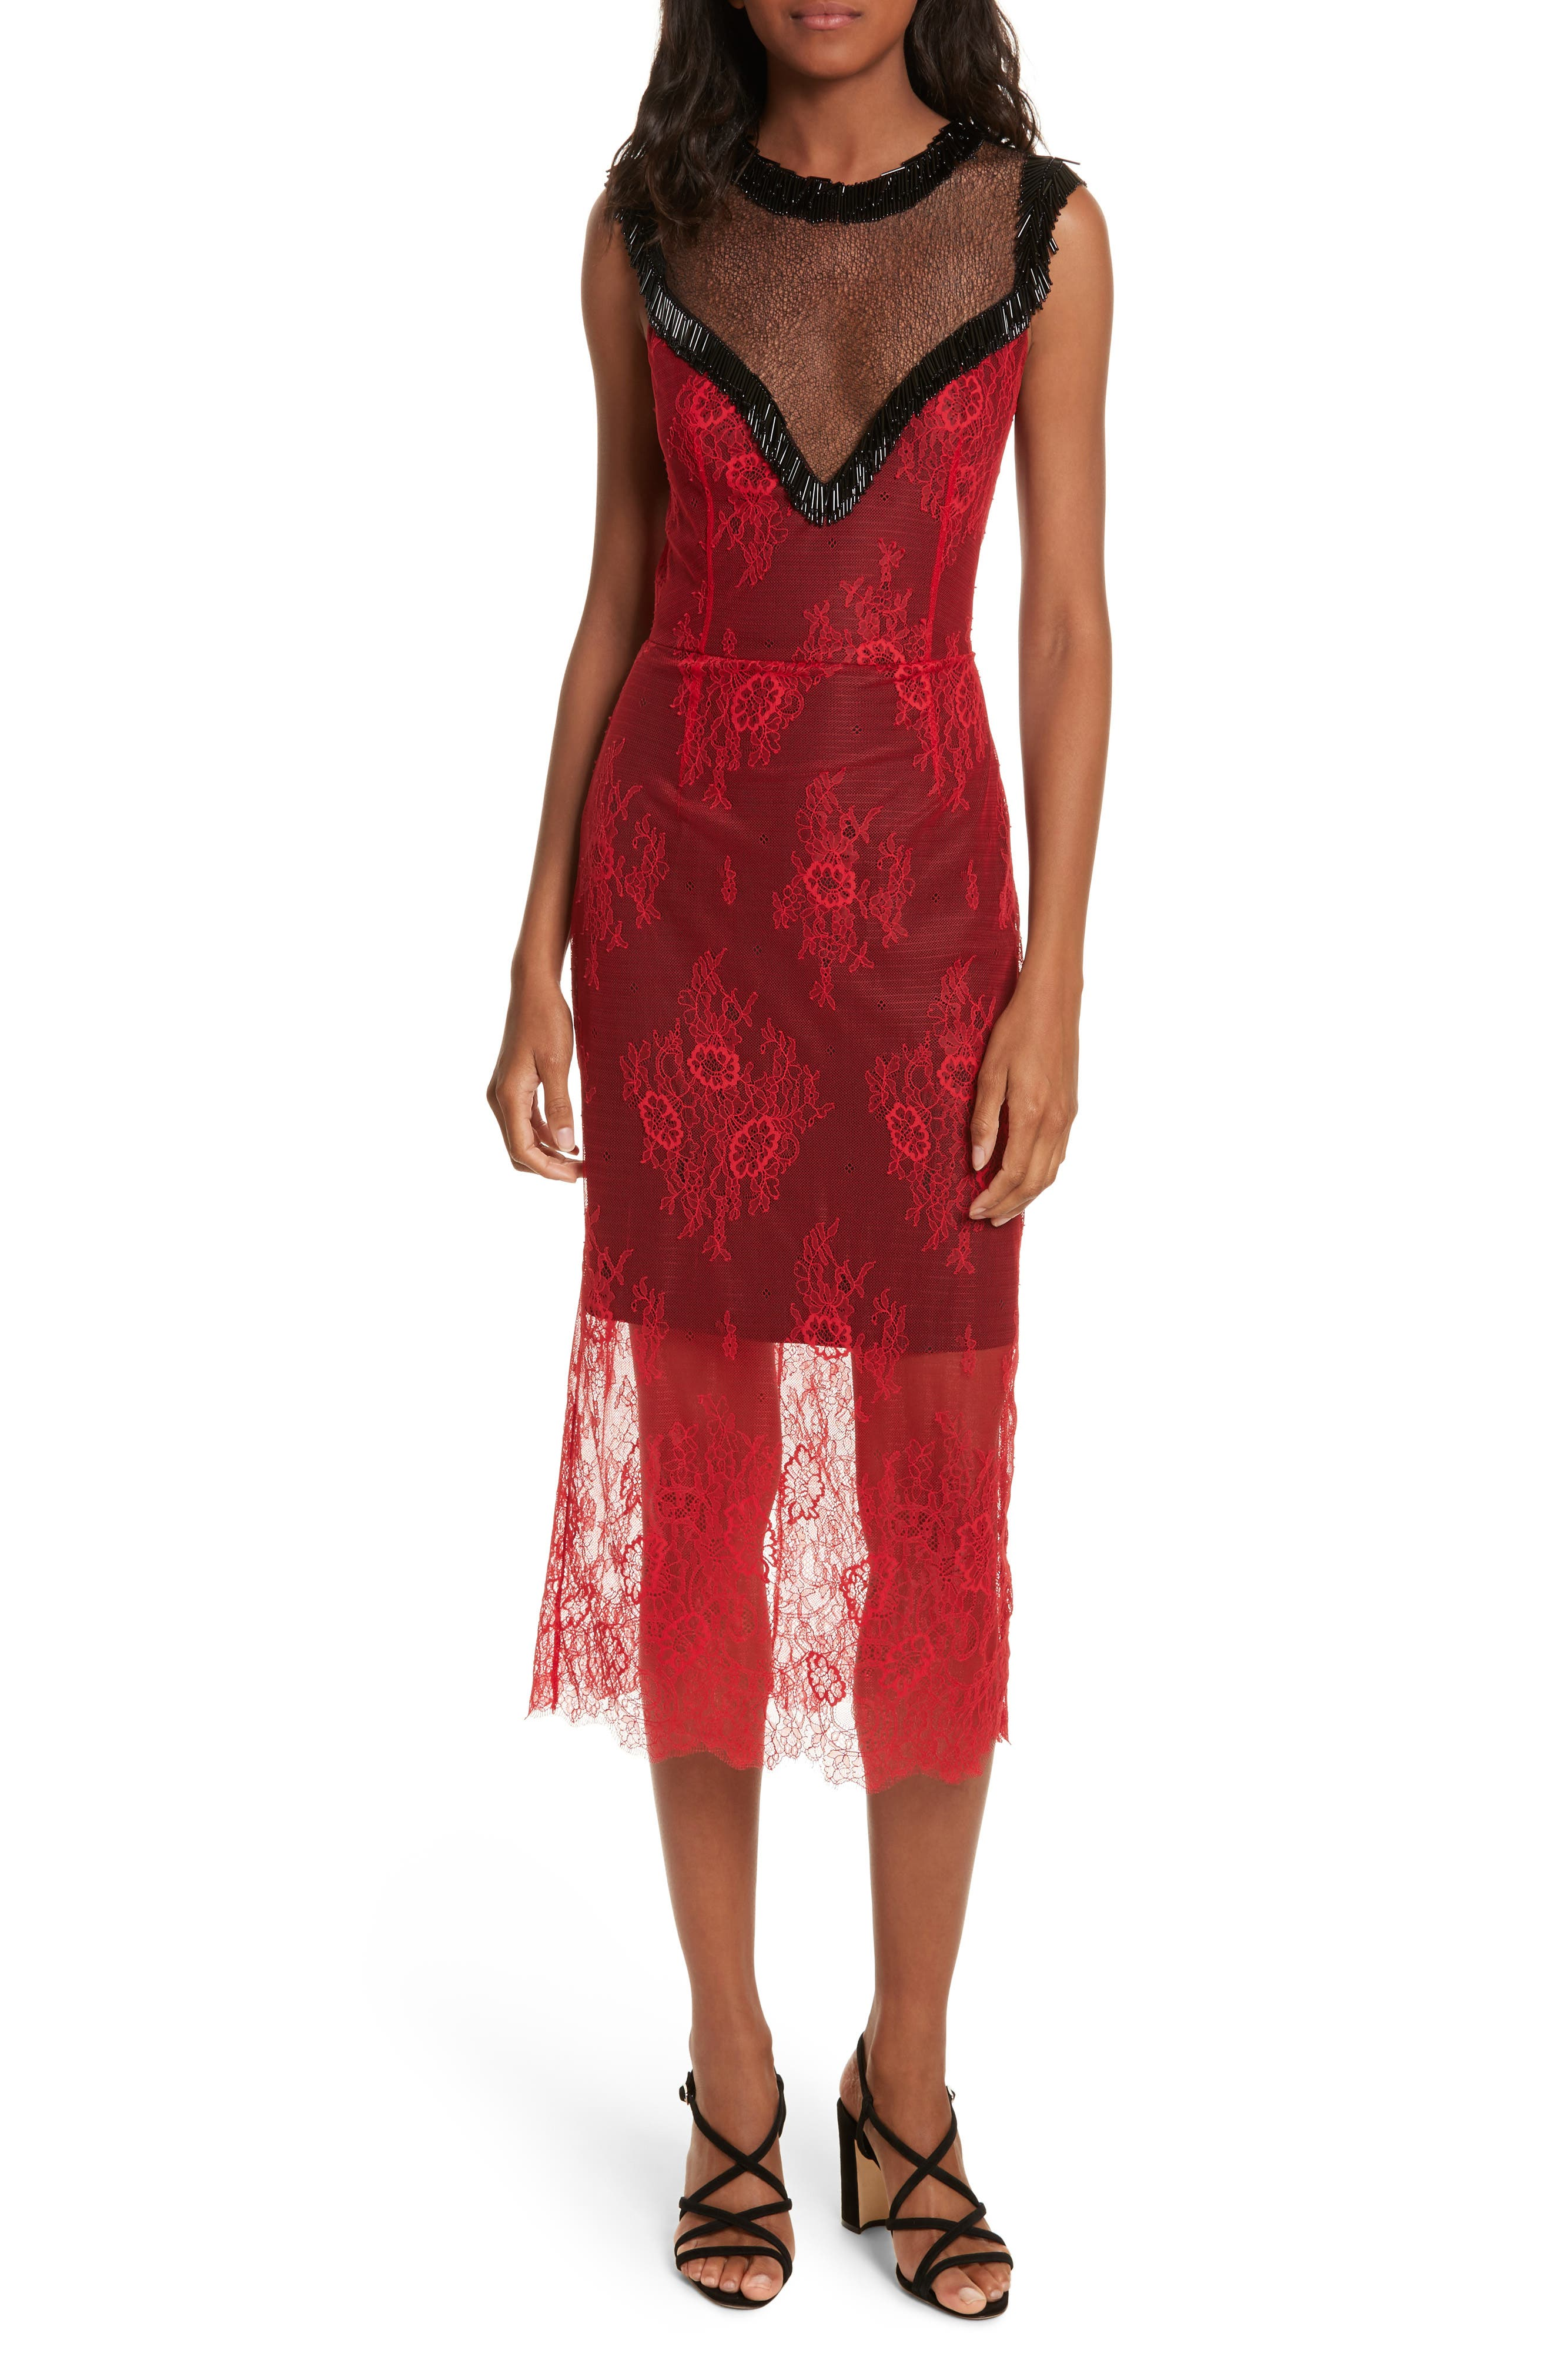 Diane von Furstenberg Beaded Lace Overlay Dress,                         Main,                         color, Lipstick/ Black